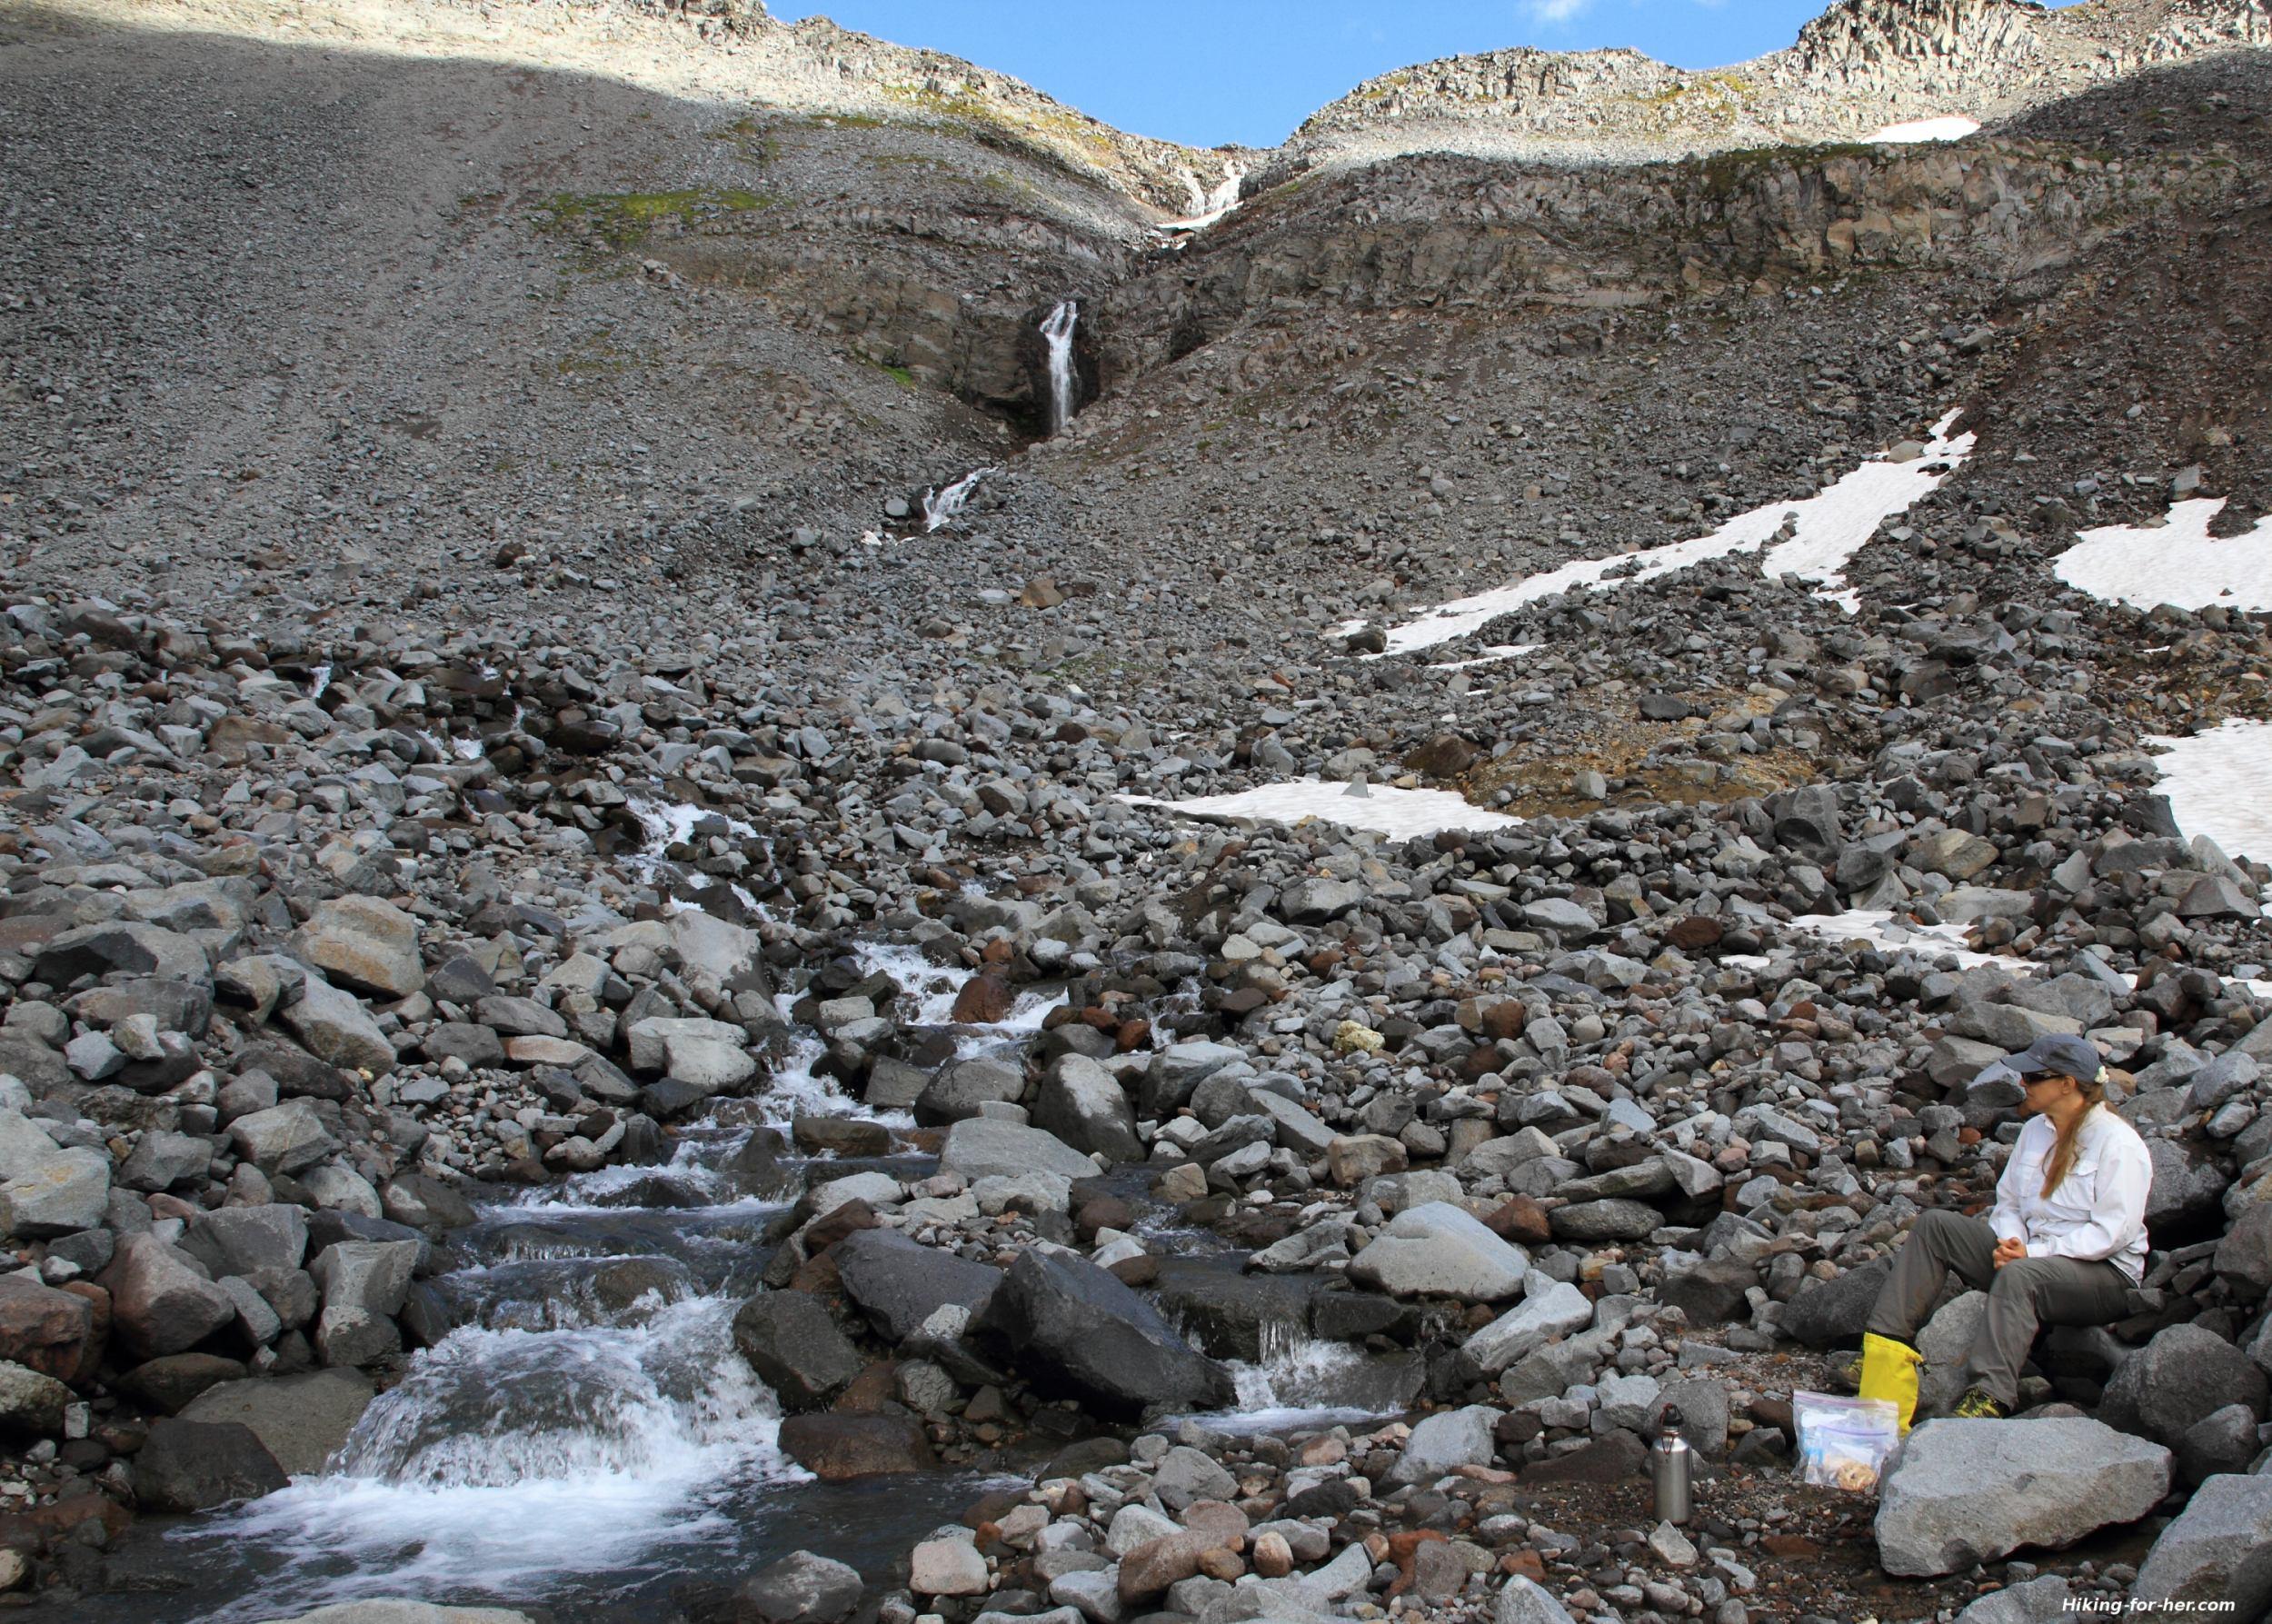 Hiker resting near a boulder filled stream